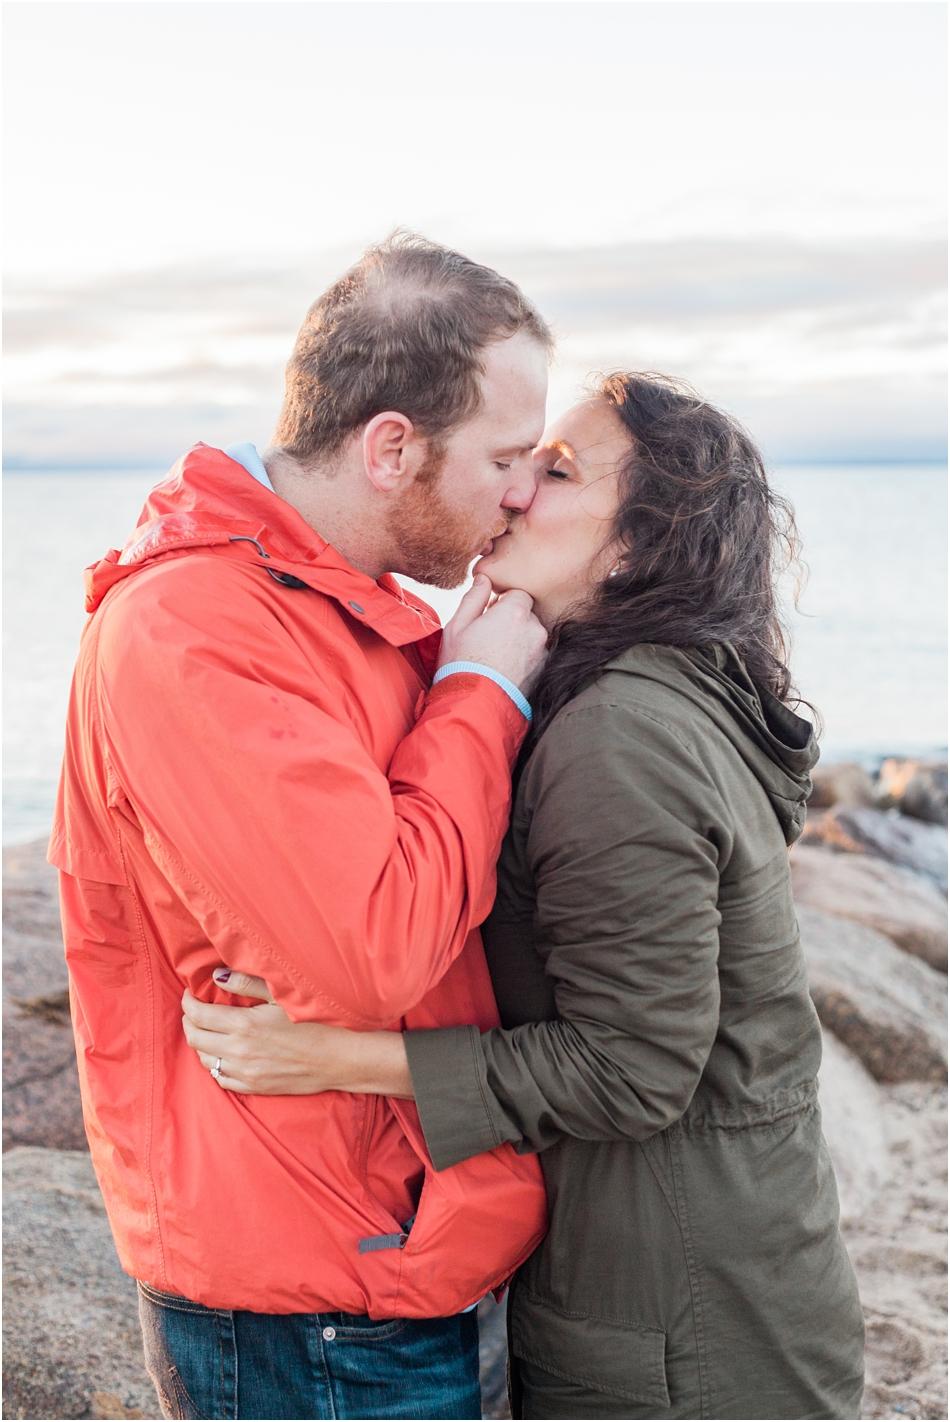 marthas_vineyard_proposal_engagement_meredith_chris_cape_cod_boston_new_england_wedding_photographer_Meredith_Jane_Photography_photo_2745.jpg